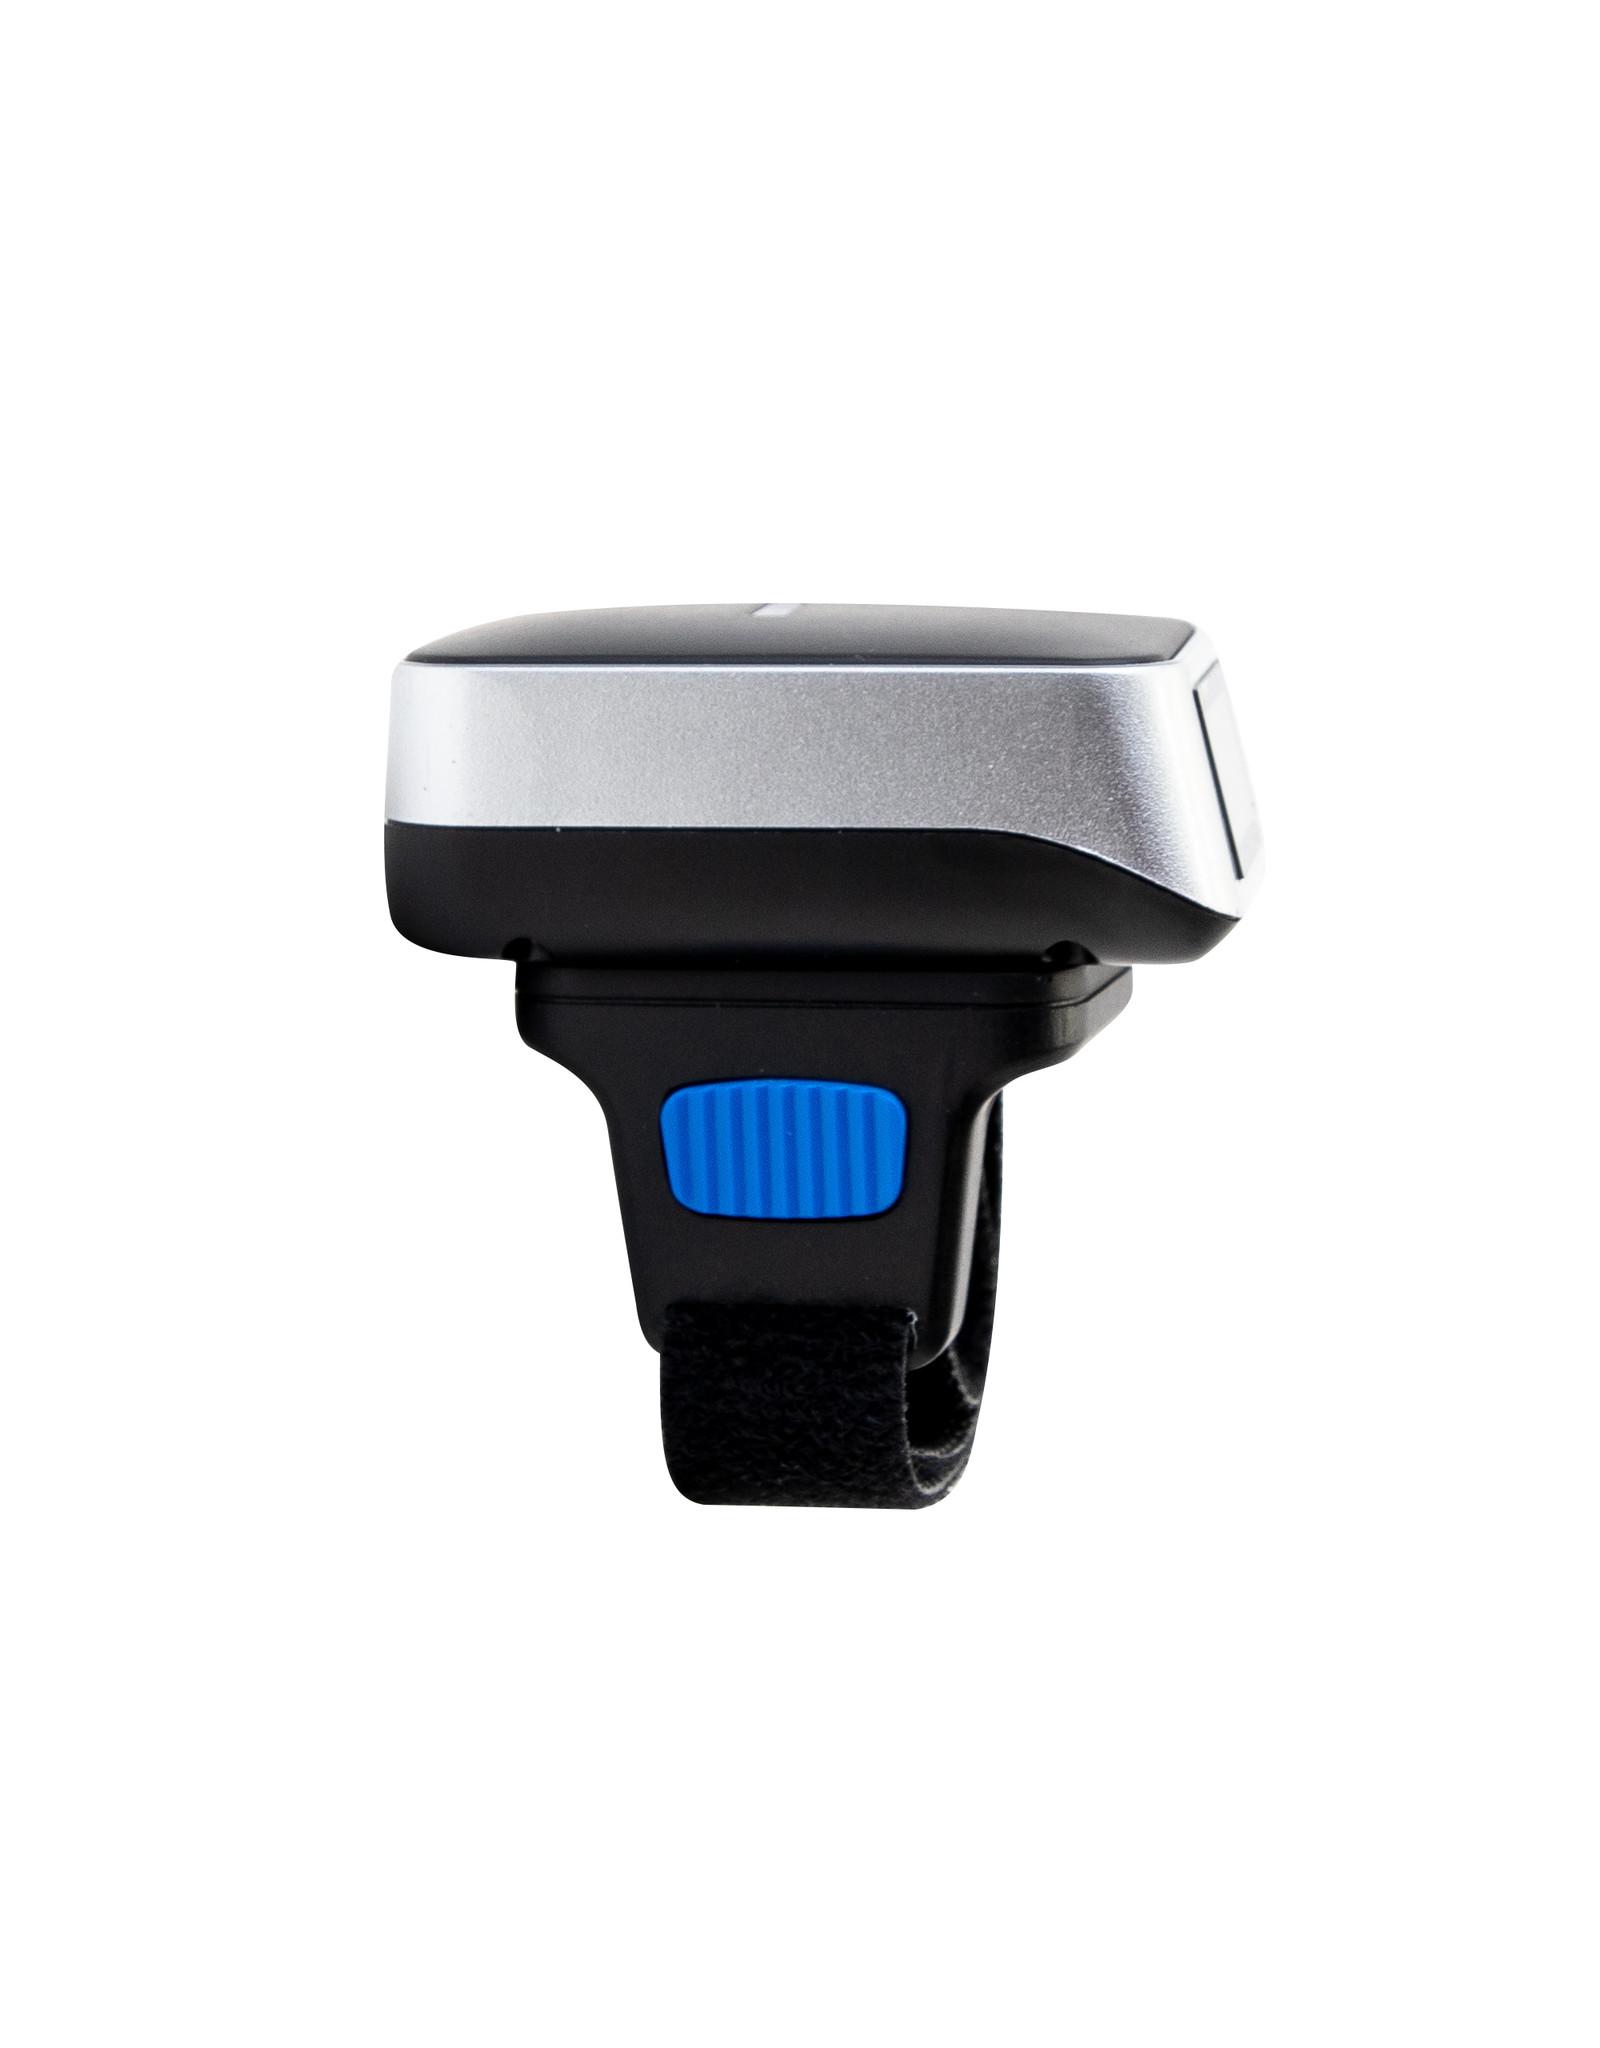 DTRONIC Vingerscanner streepjescode en QR - DTRONIC DI9020 | Bluetooth